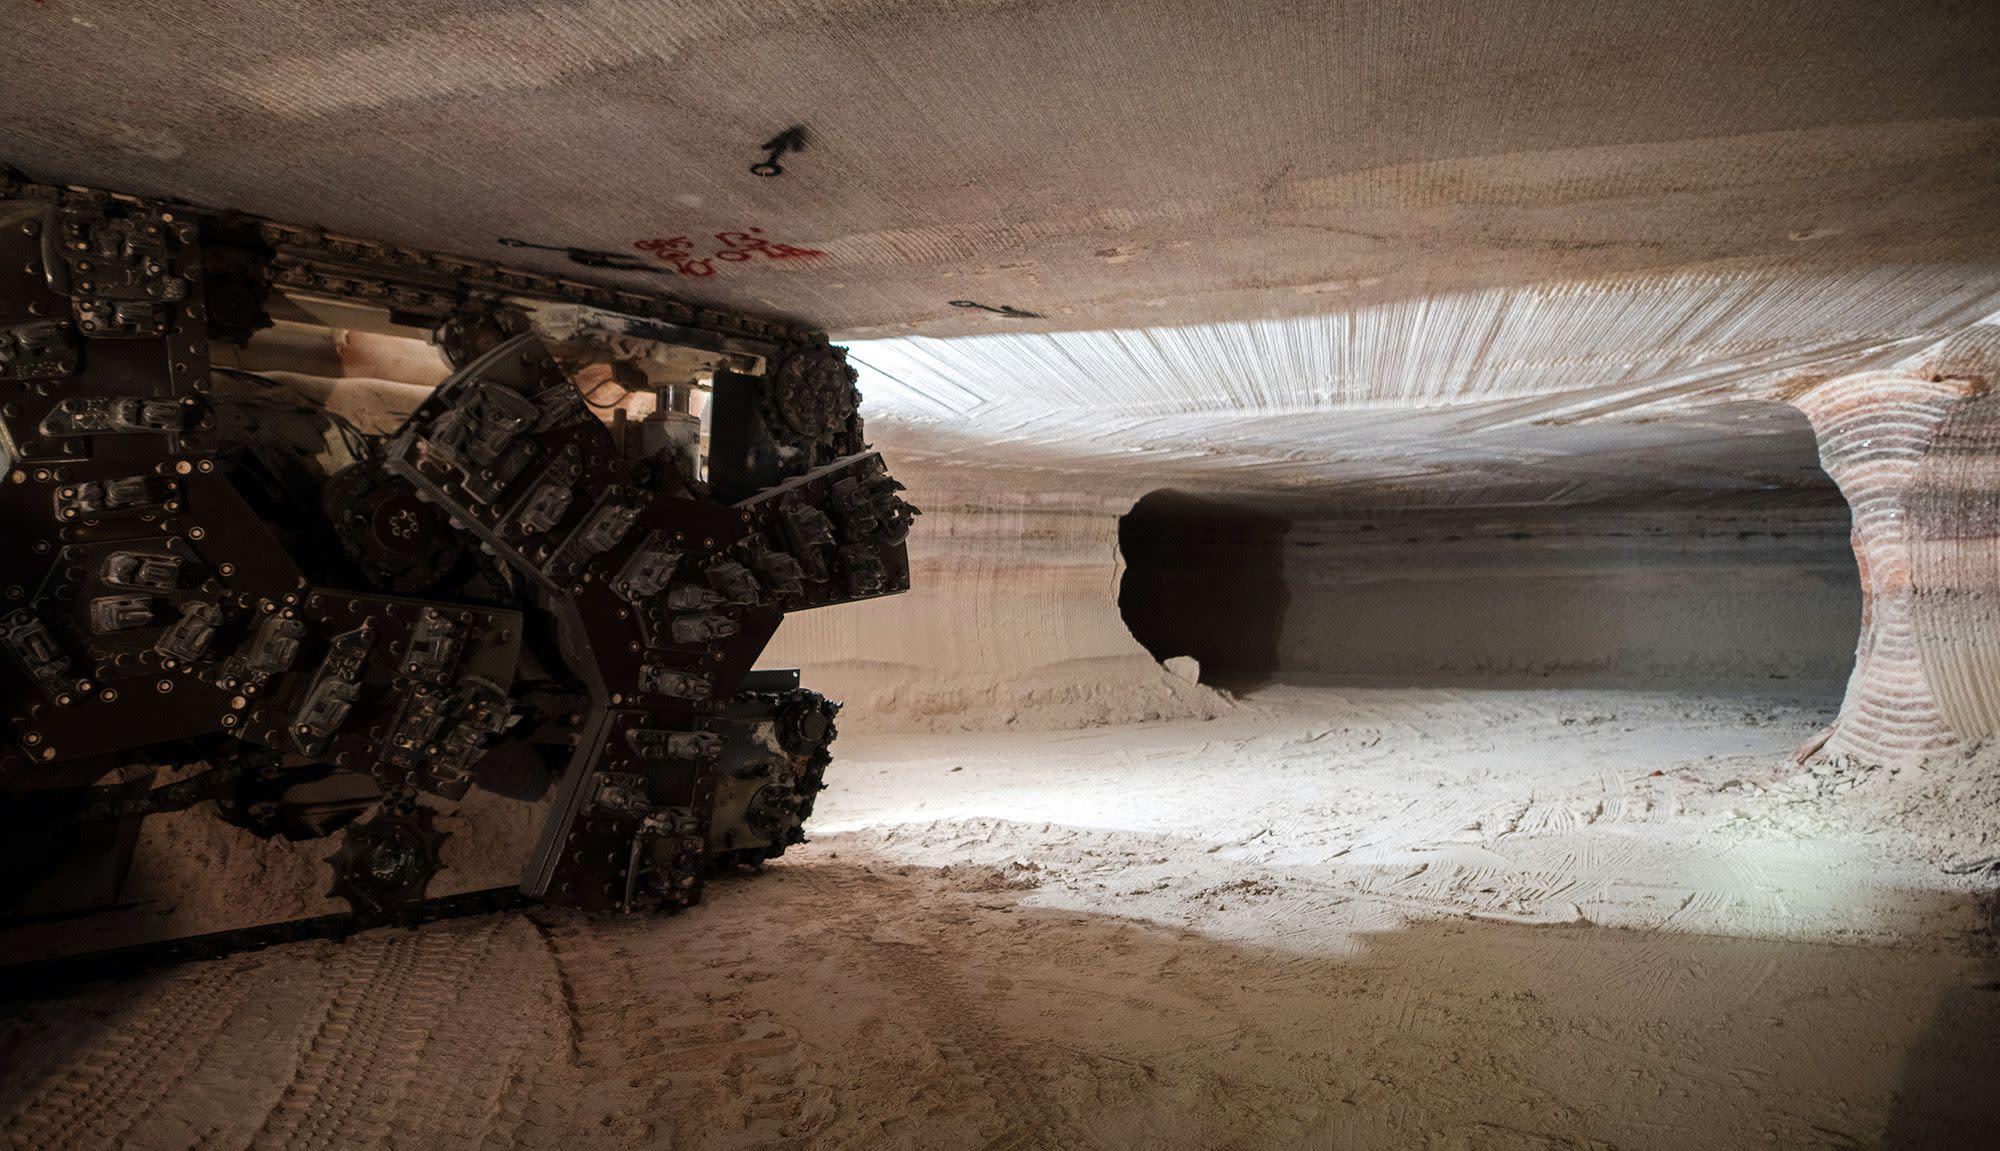 Mosaic Shares Fall After Early Mine Closure Cuts Potash Output